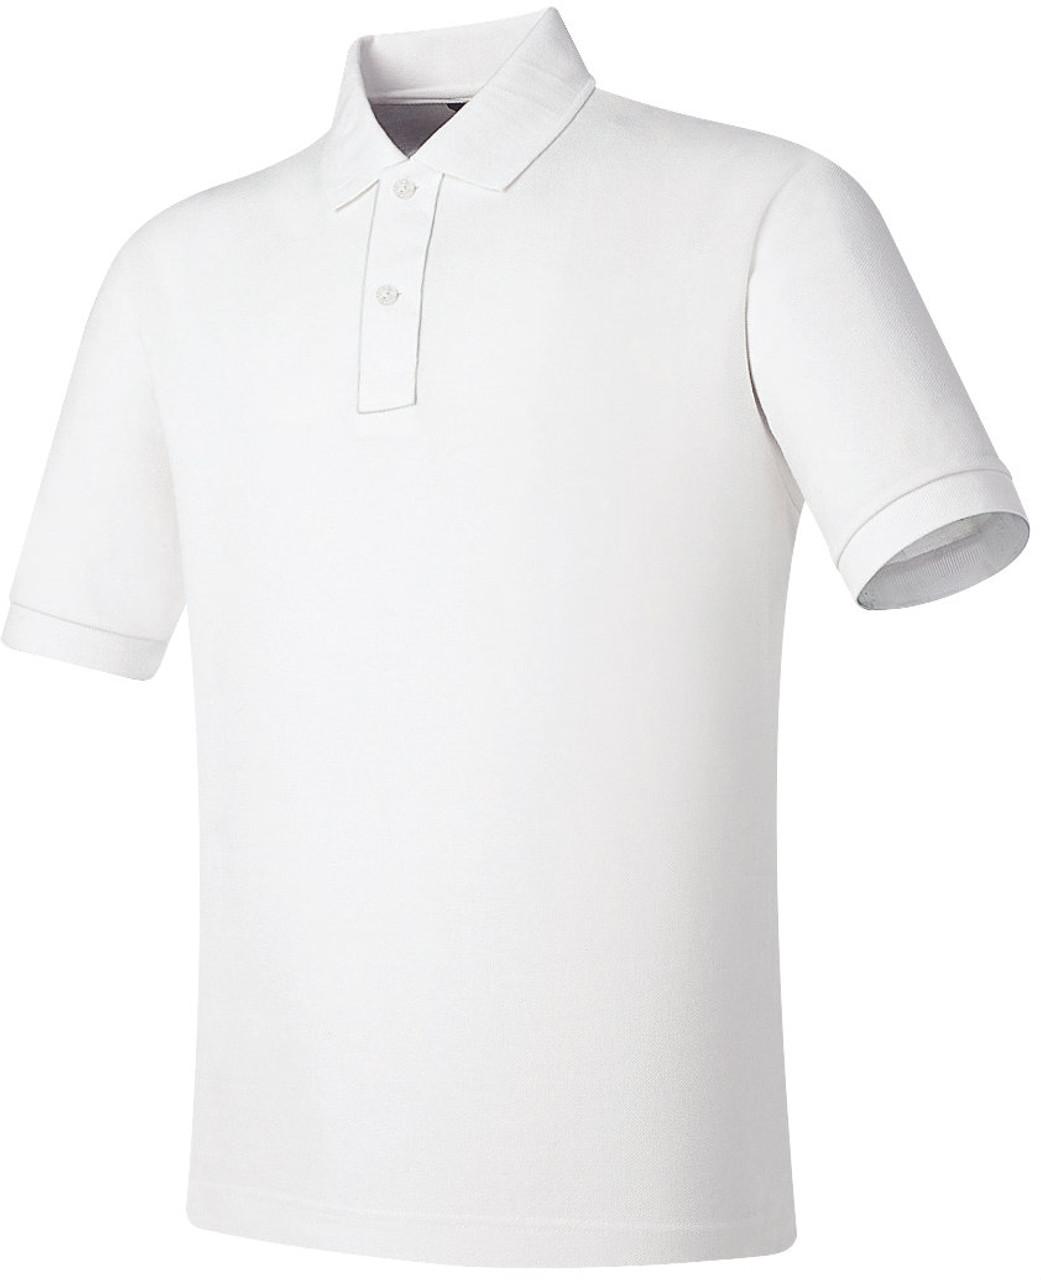 white Cotton P.K Polo shirt side placket